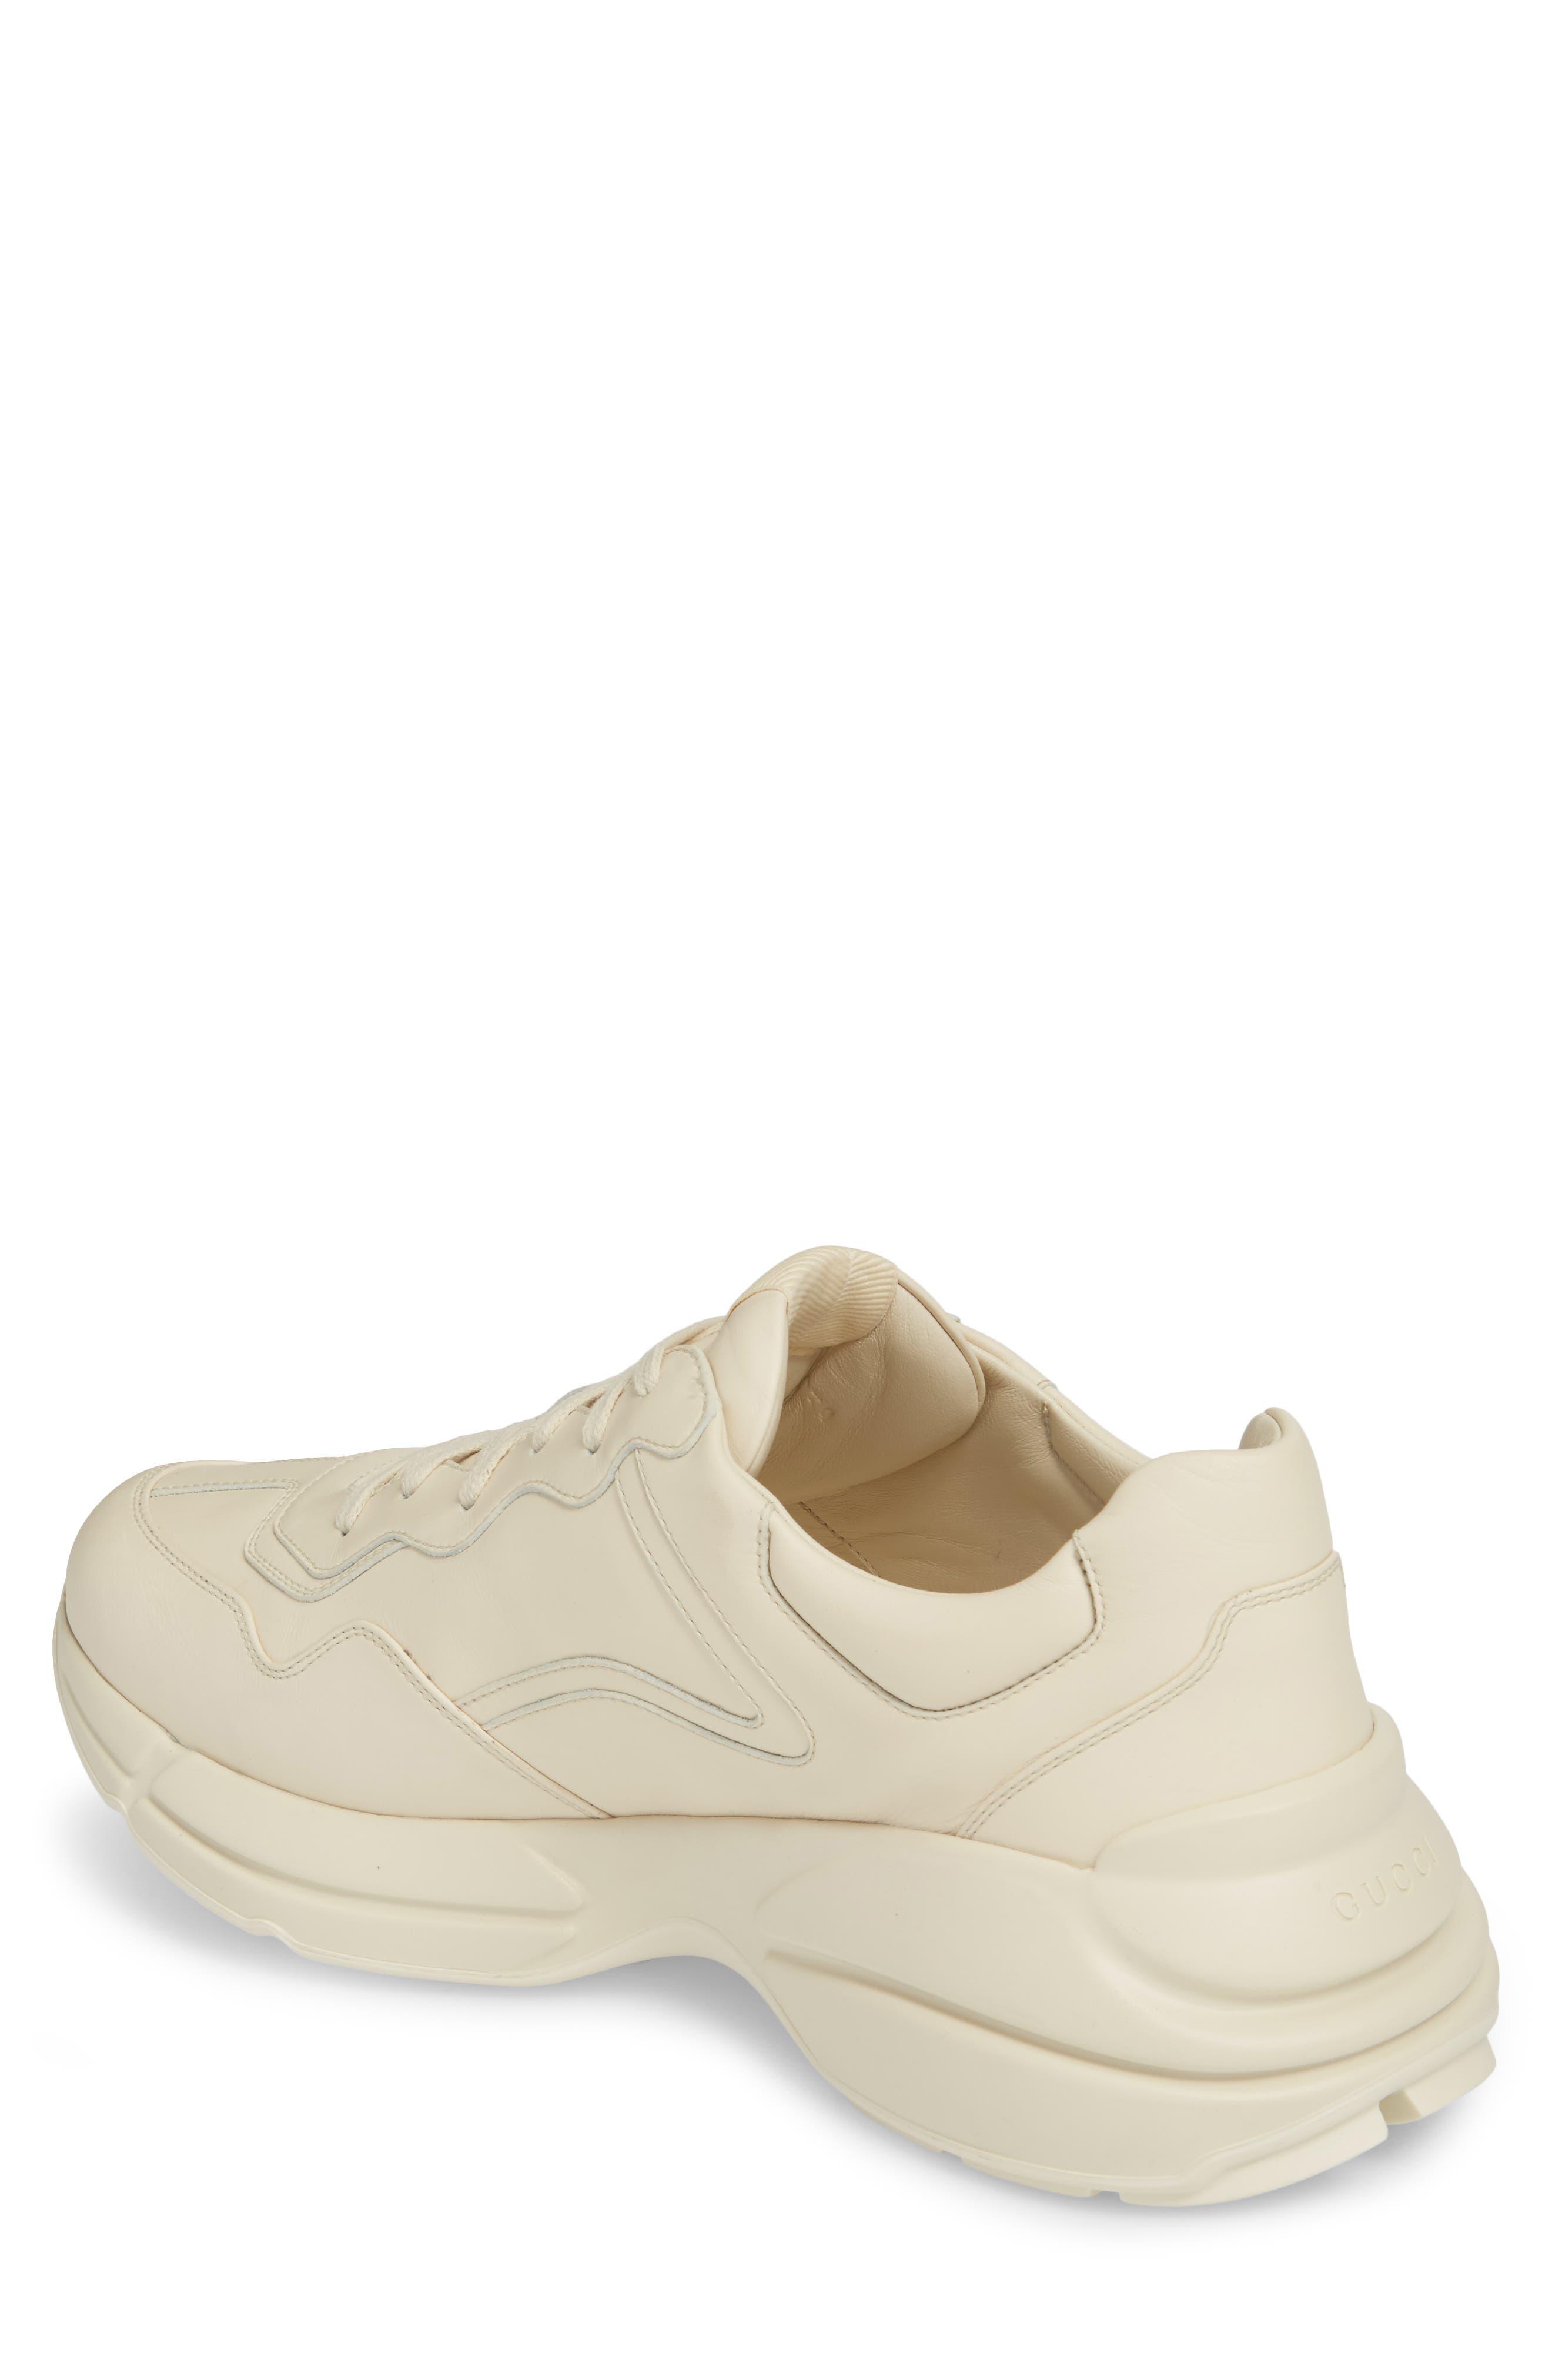 GUCCI, Logo Leather Sneaker, Alternate thumbnail 2, color, WHITE PRINT